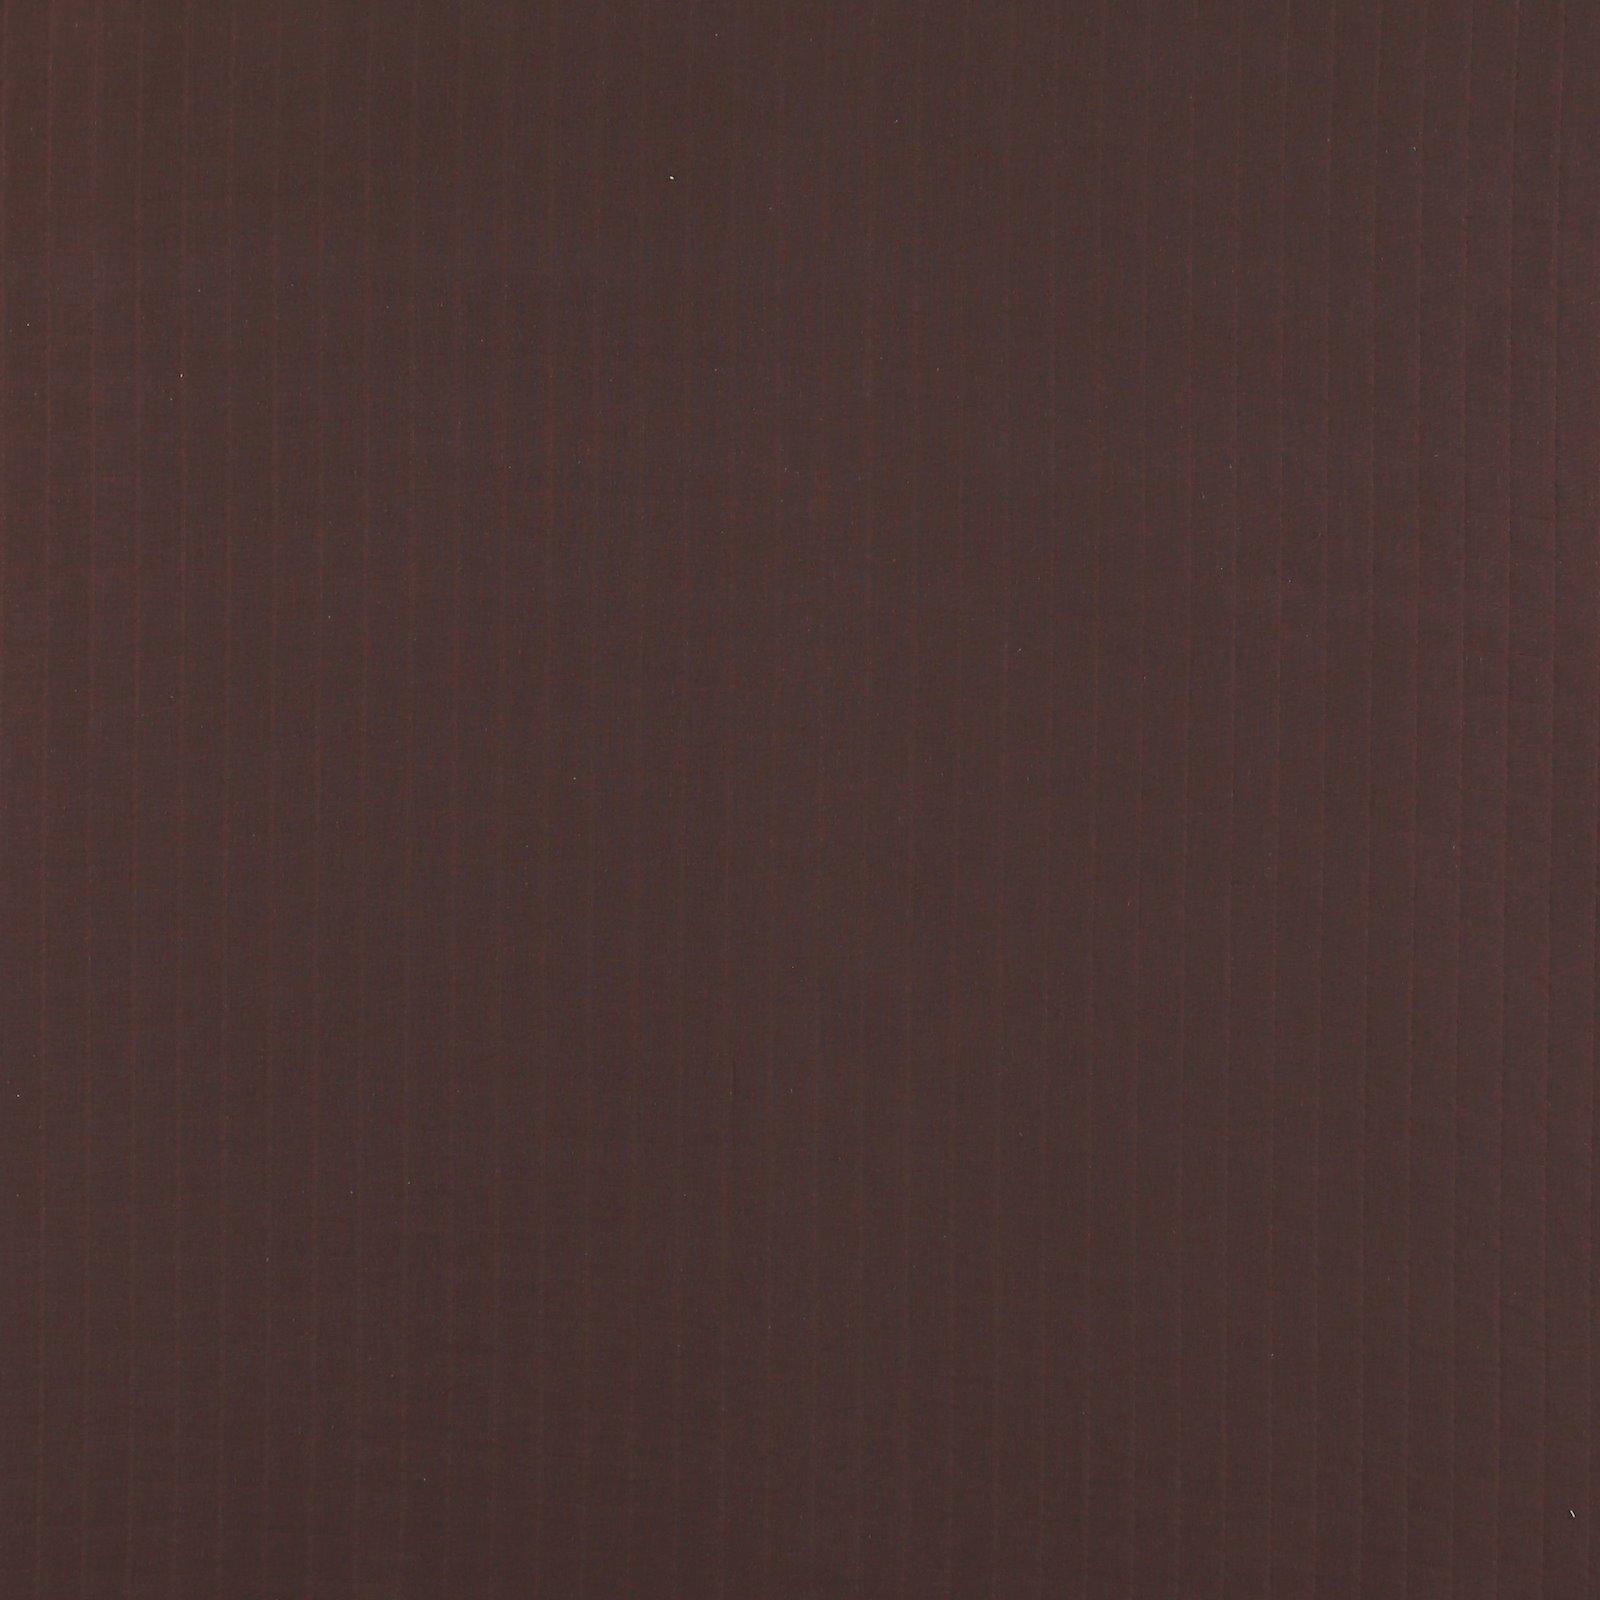 Muslin chestnut brown 501892_pack_sp